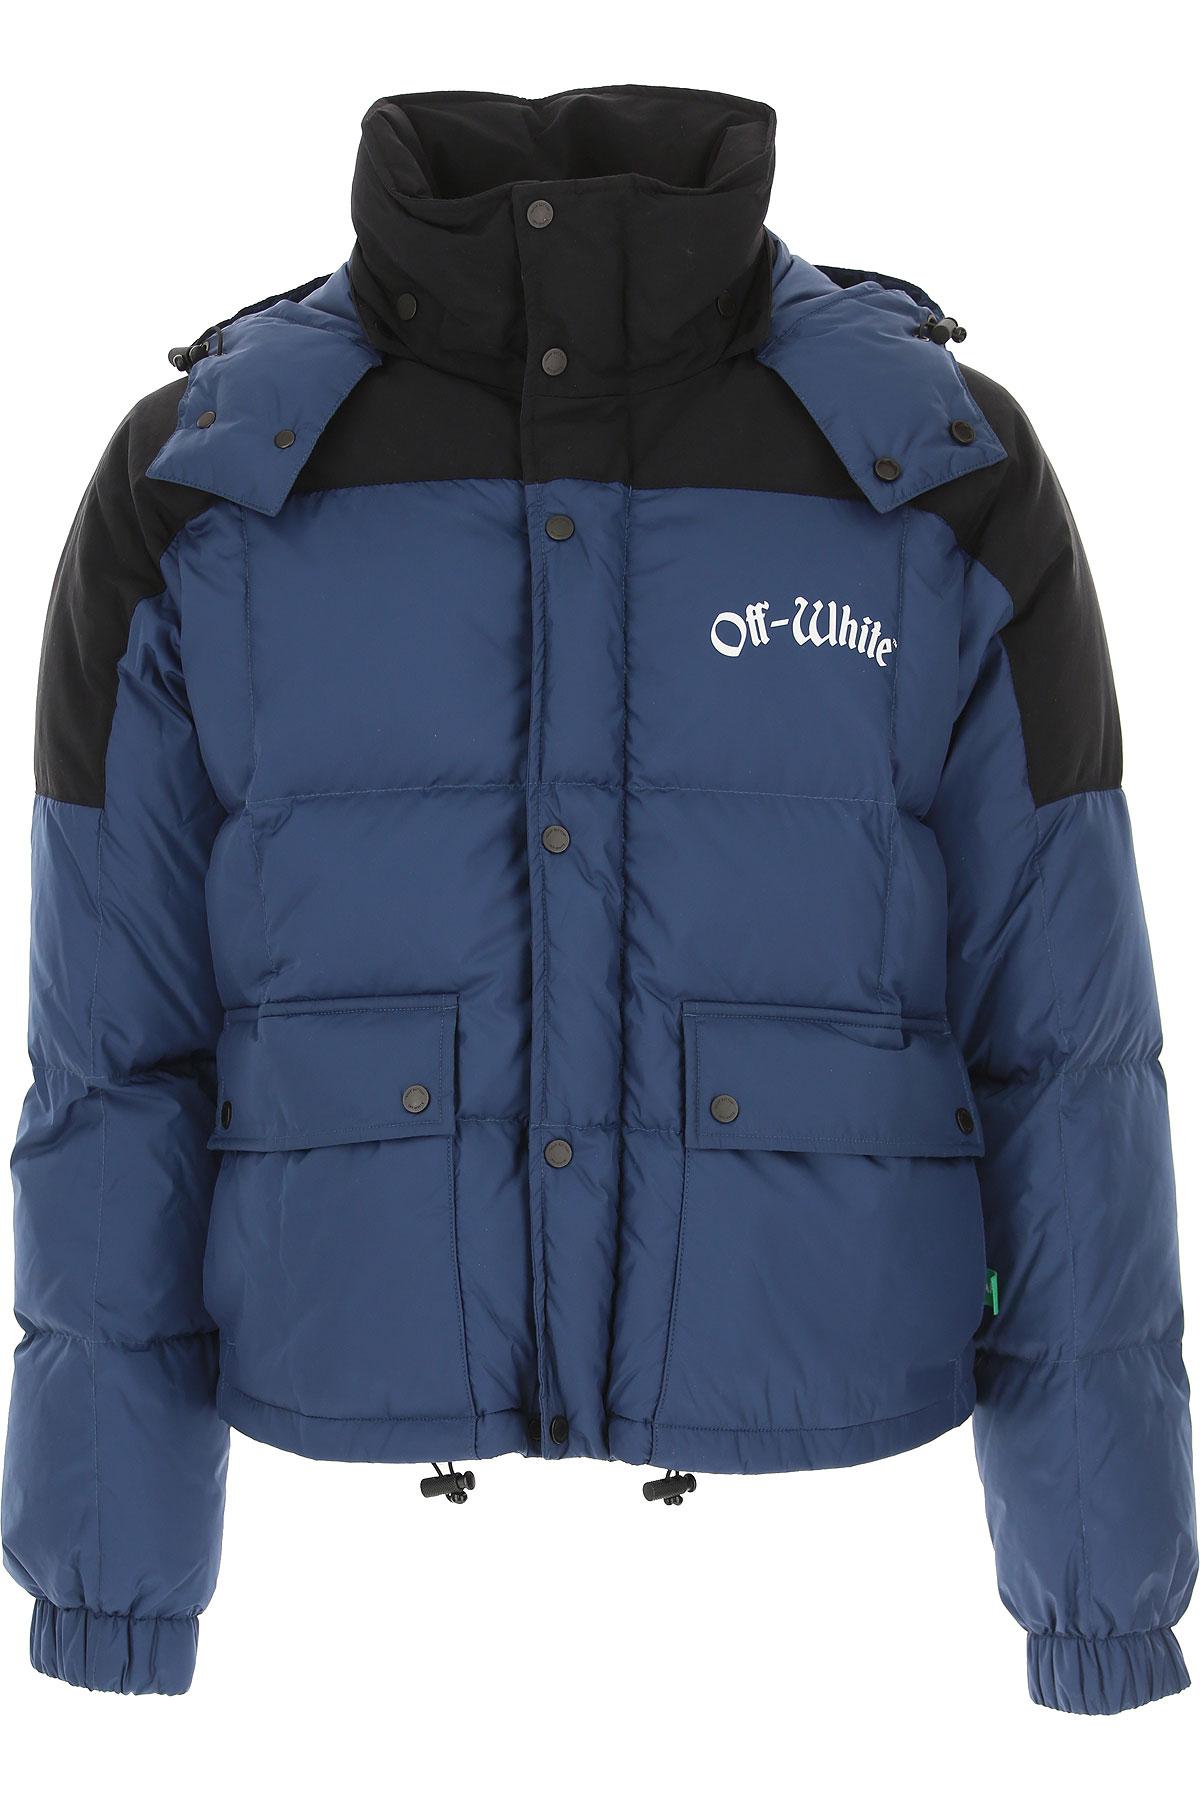 Off-White Virgil Abloh Down Jacket for Men, Puffer Ski Jacket, Avio Blue, Down, 2019, M S